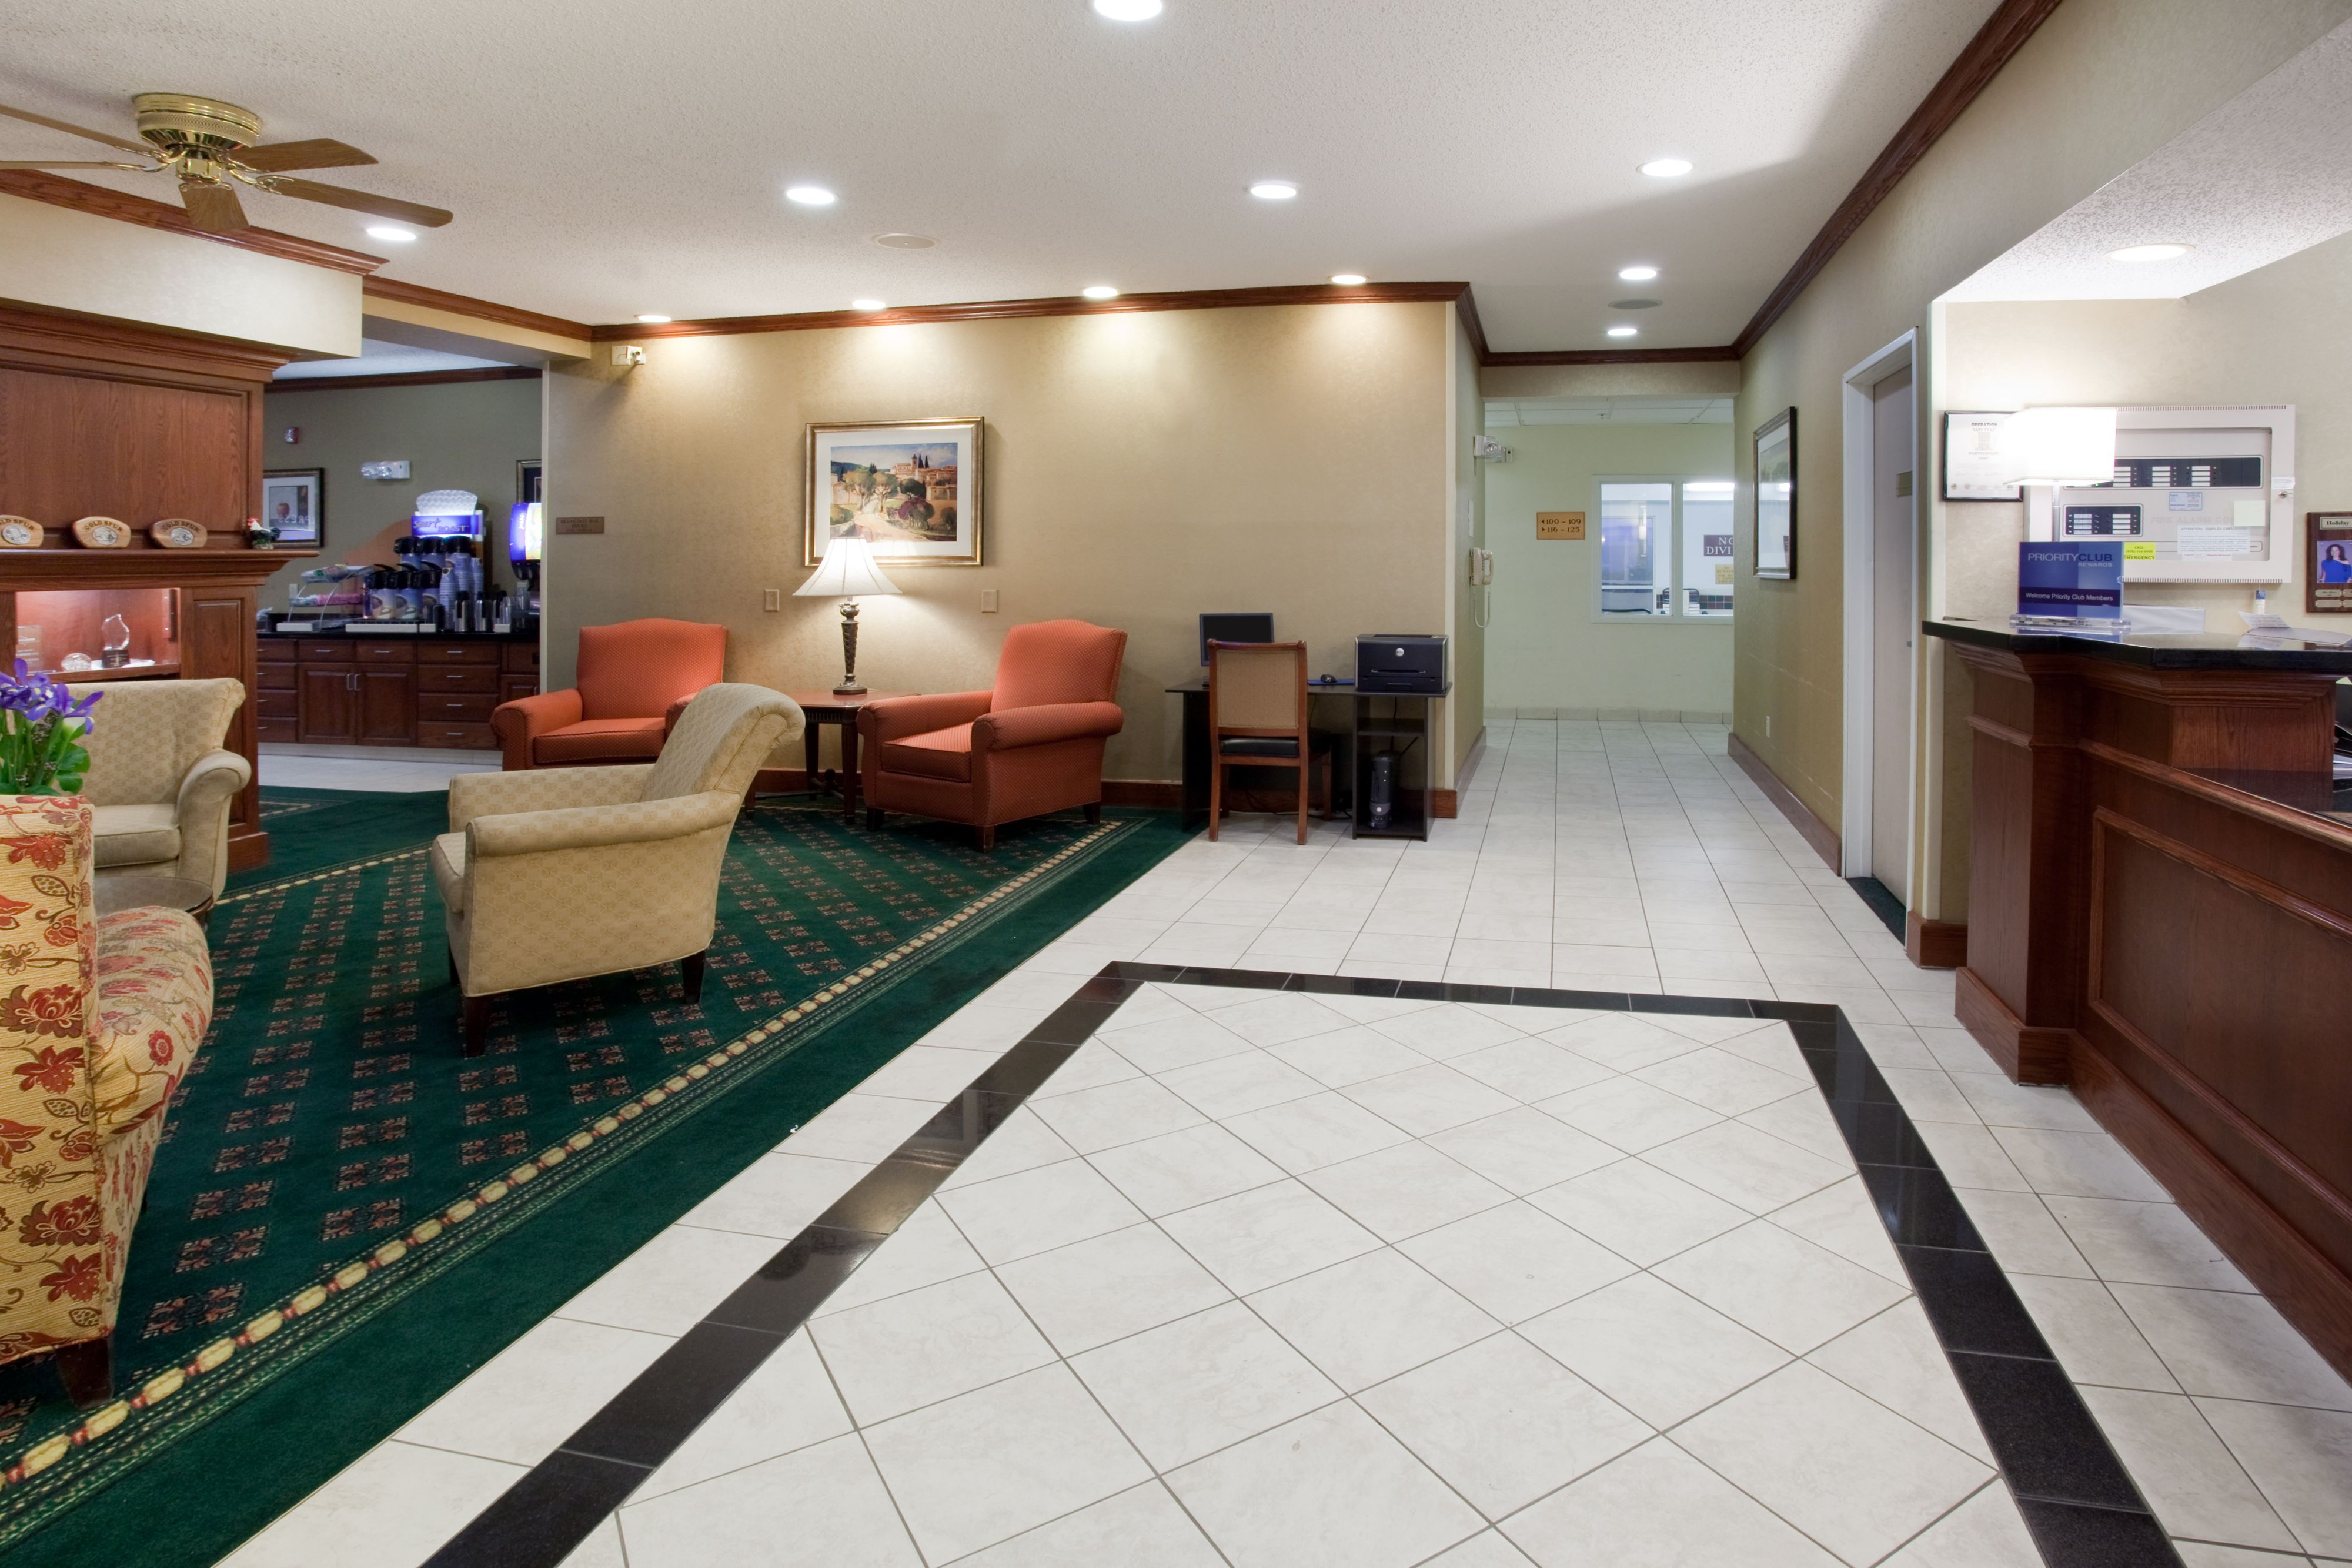 Holiday Inn Express Greeley image 5